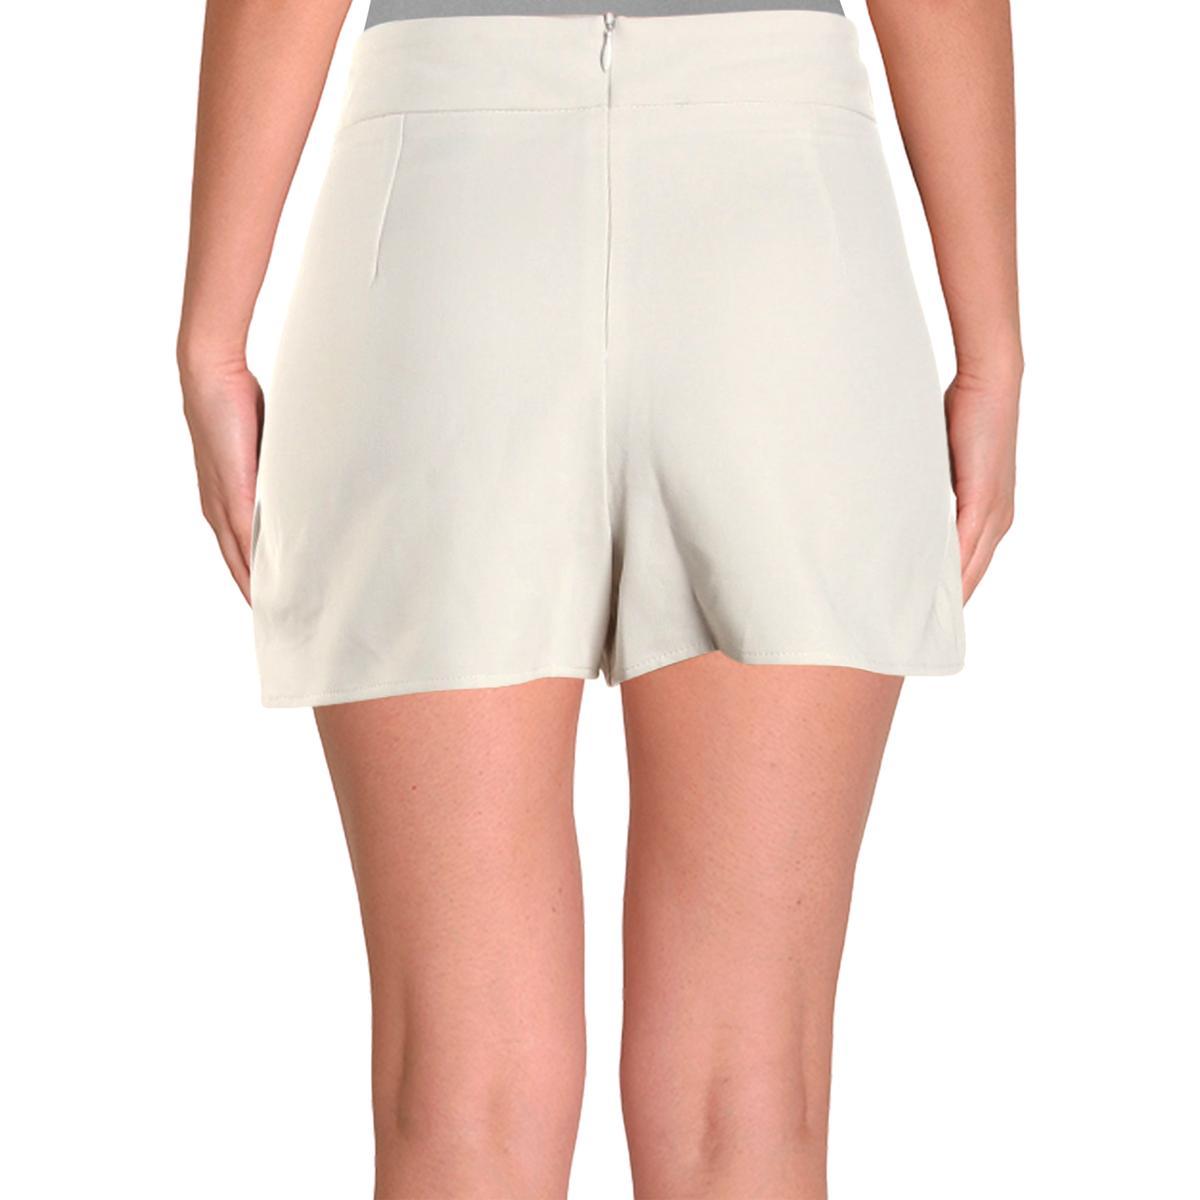 Aqua Womens Linen Blend High Rise Paperbag Shorts BHFO 6812